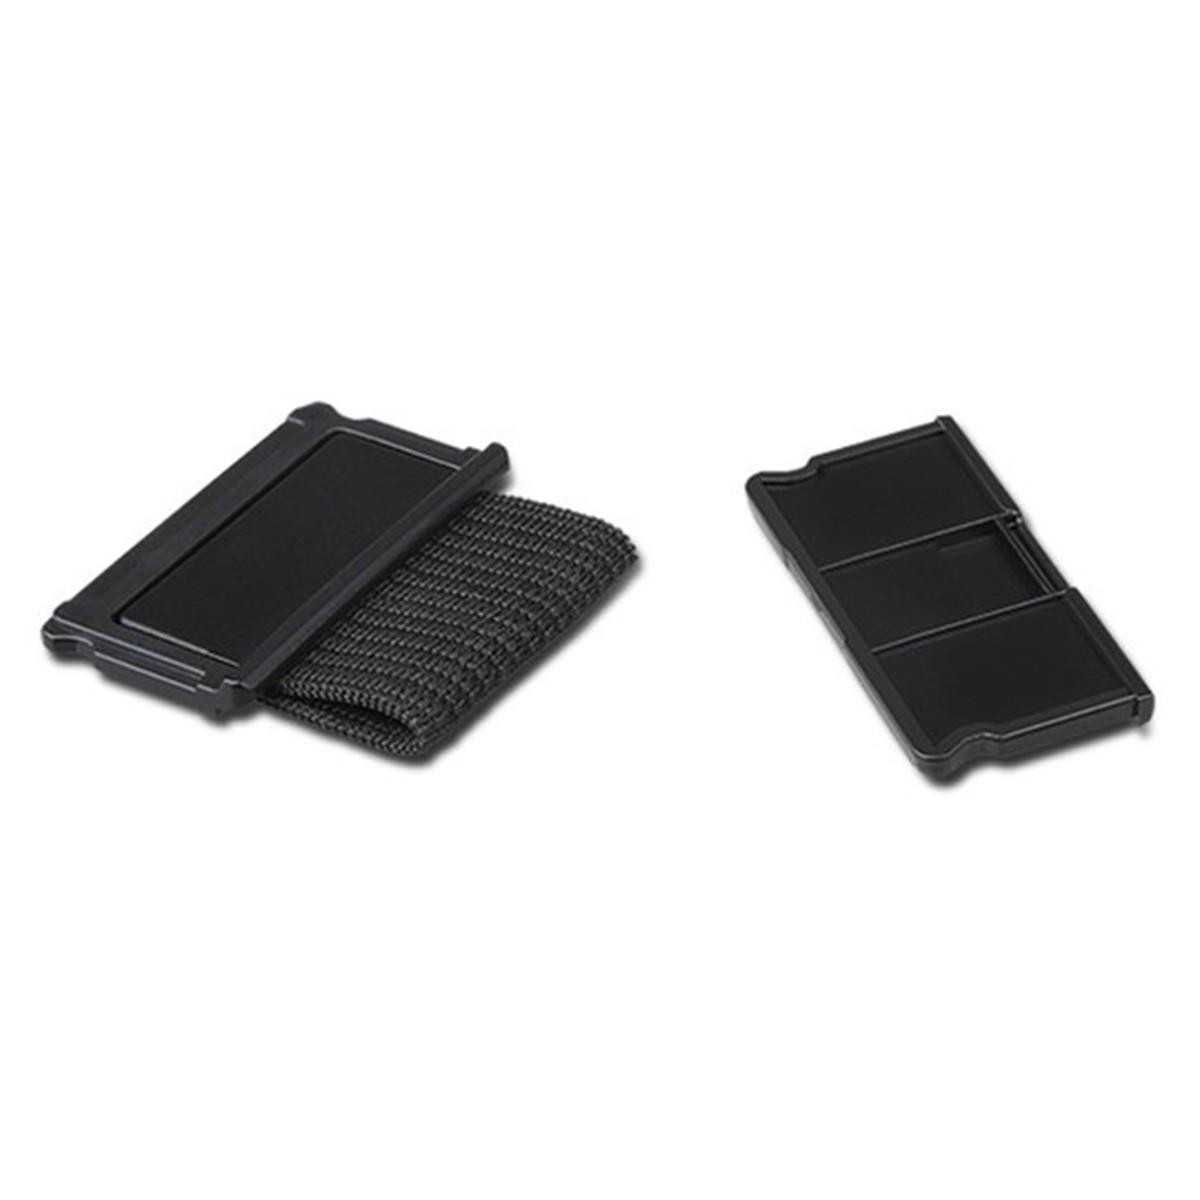 (EOL) Lenovo™ ThinkPad® X1 Tablet Thin Tastatur Stifthalter Kit